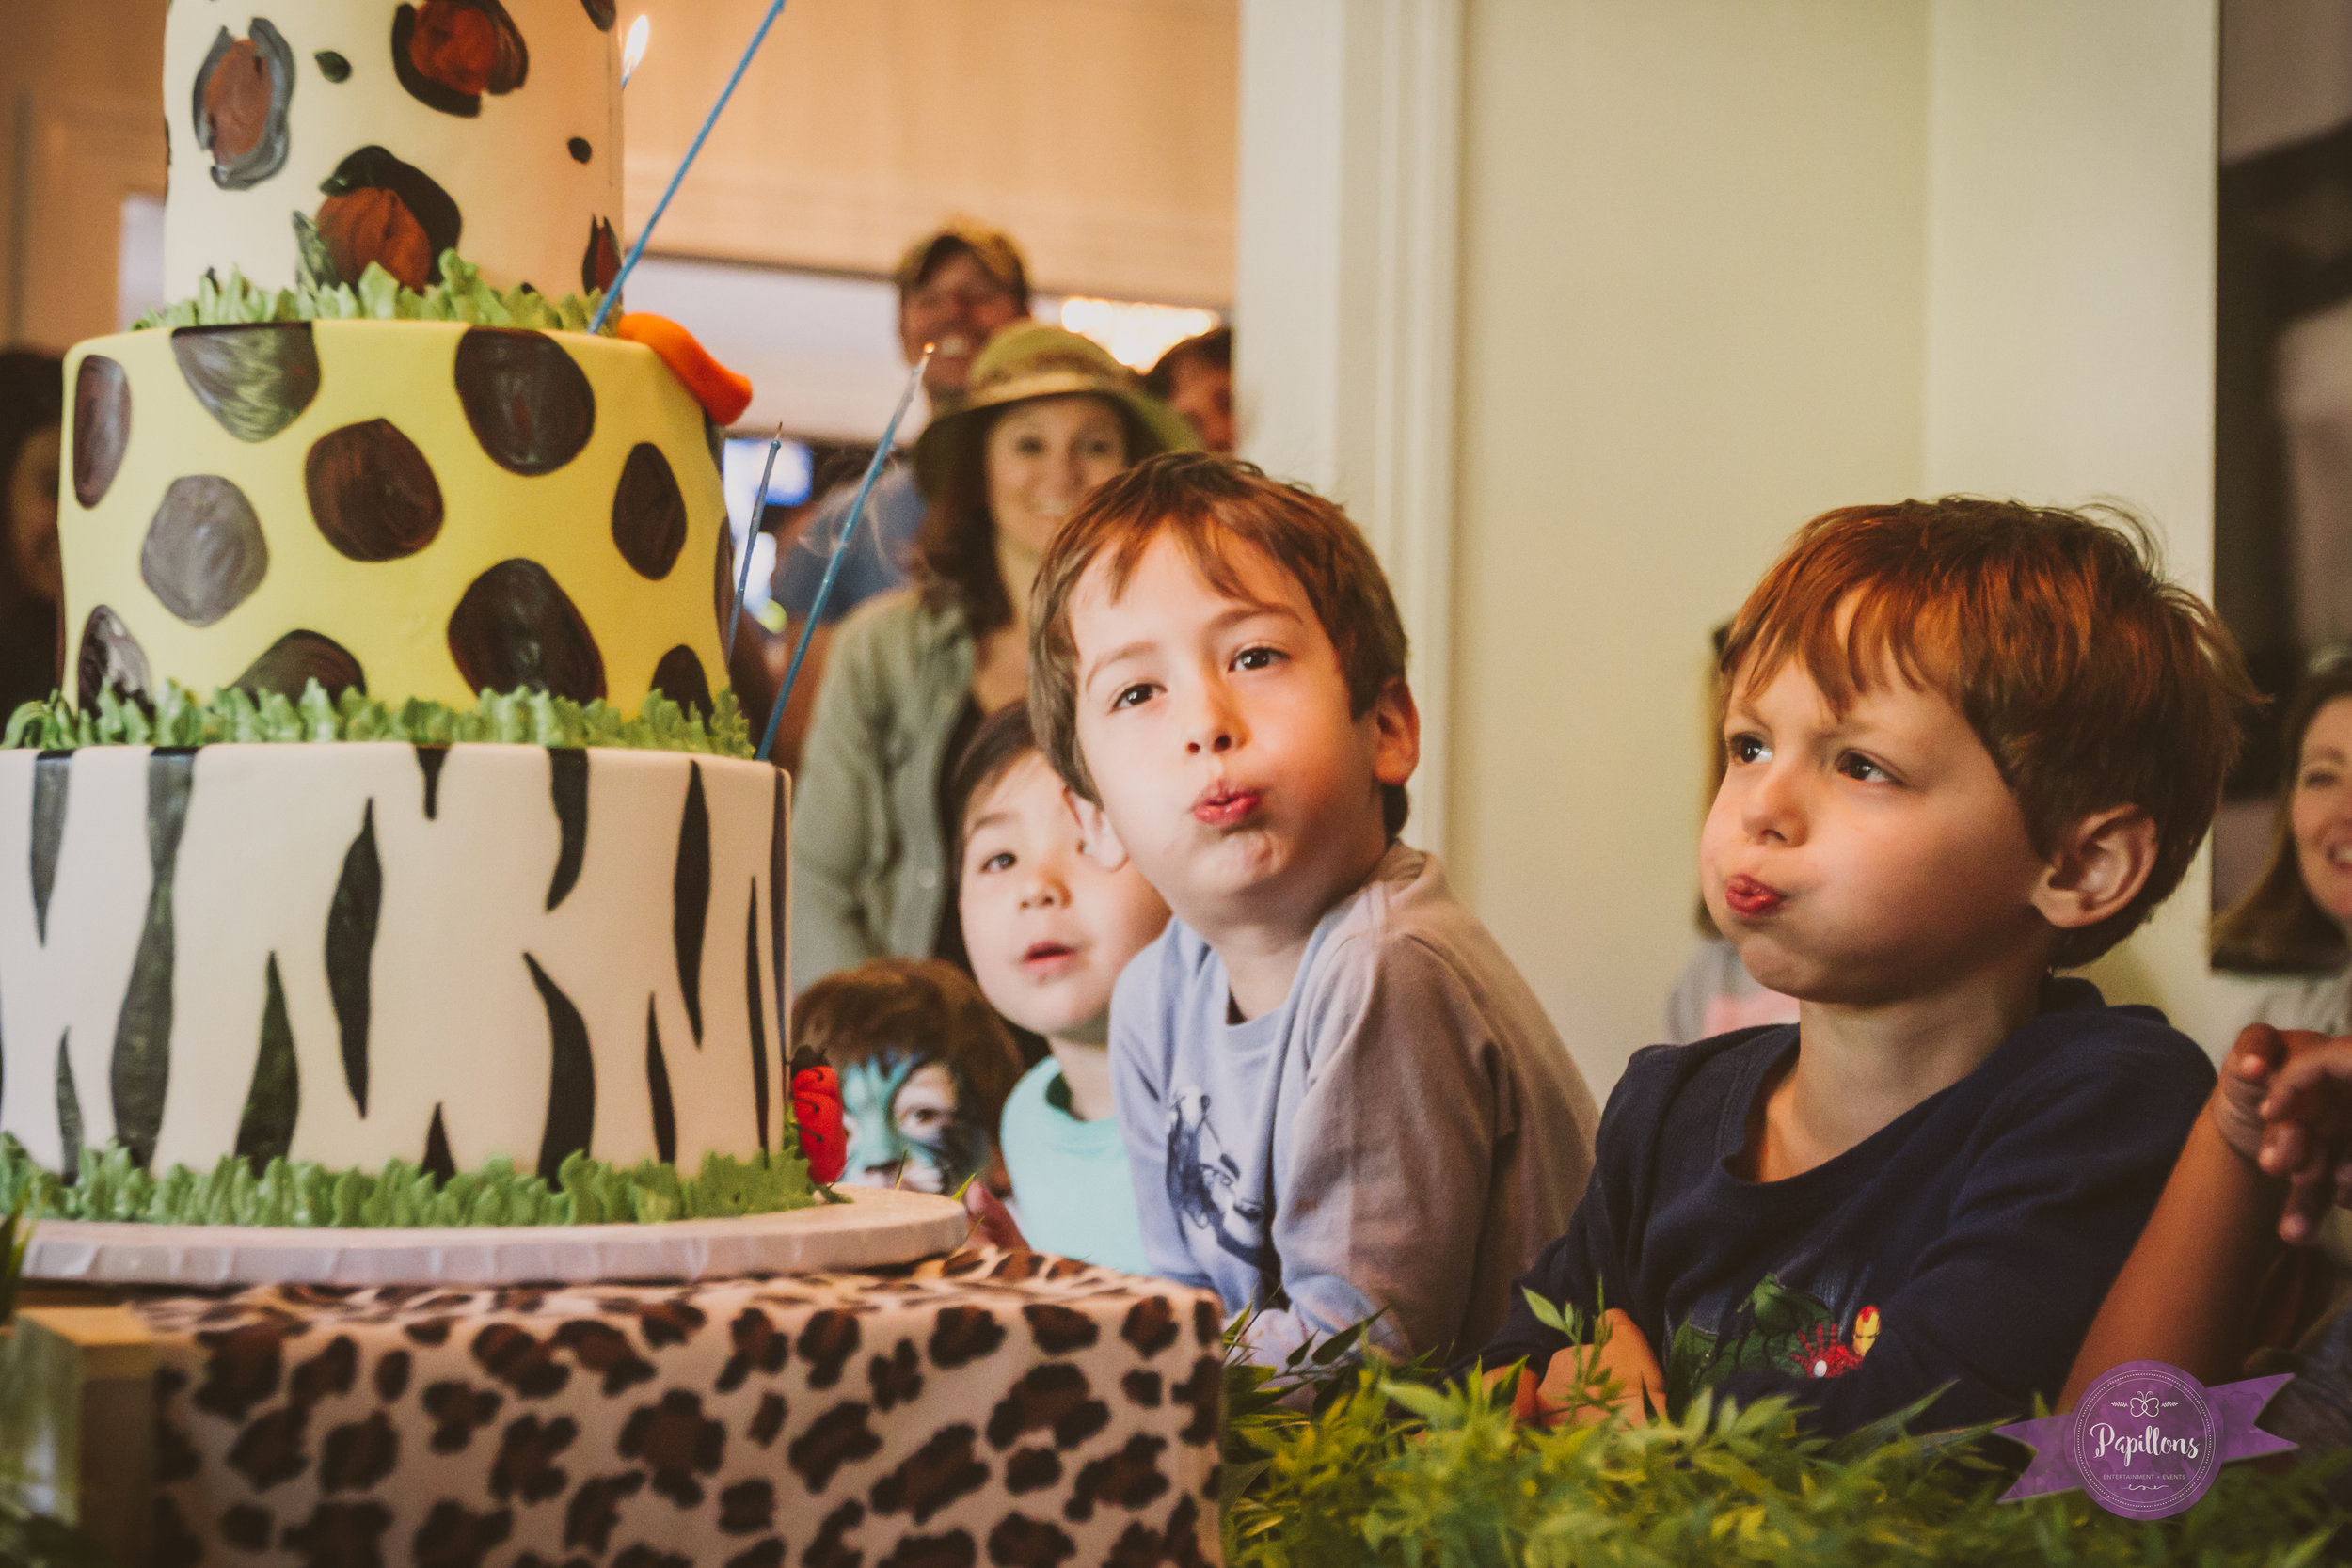 leo safari party cake make a wish 2.jpg